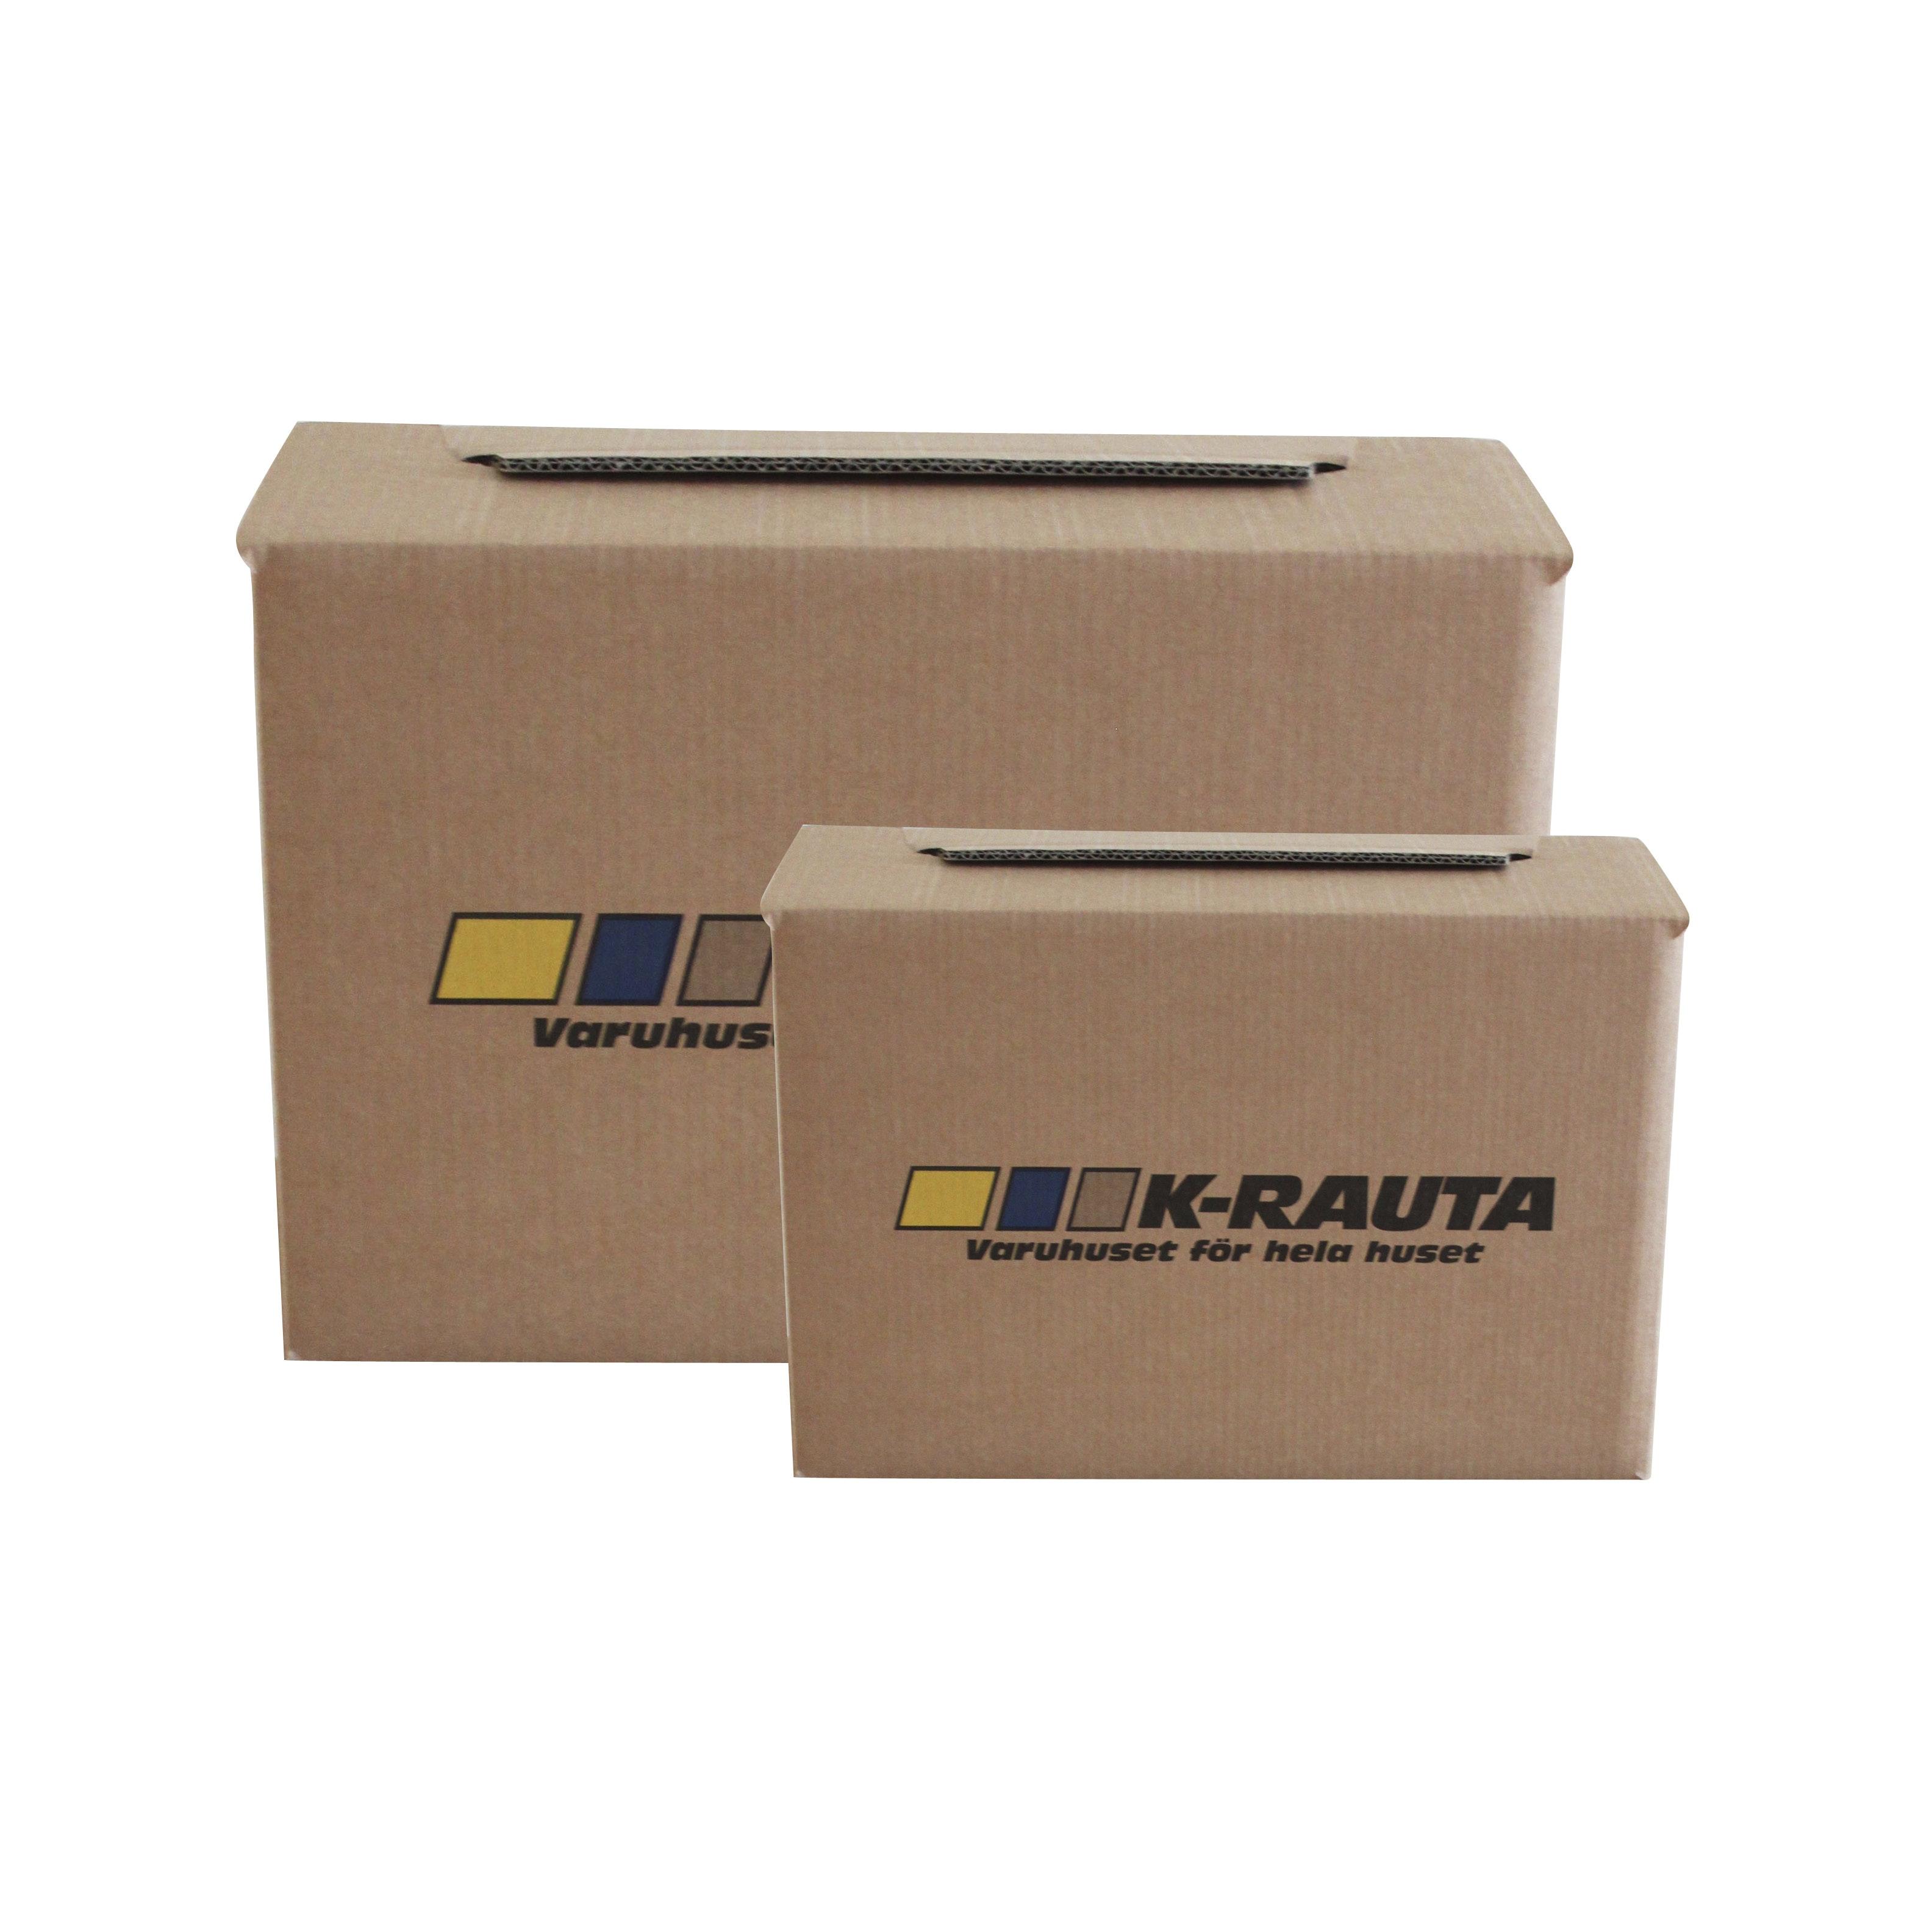 Flyttlåda K-rauta Boklåda 40x30x30cm